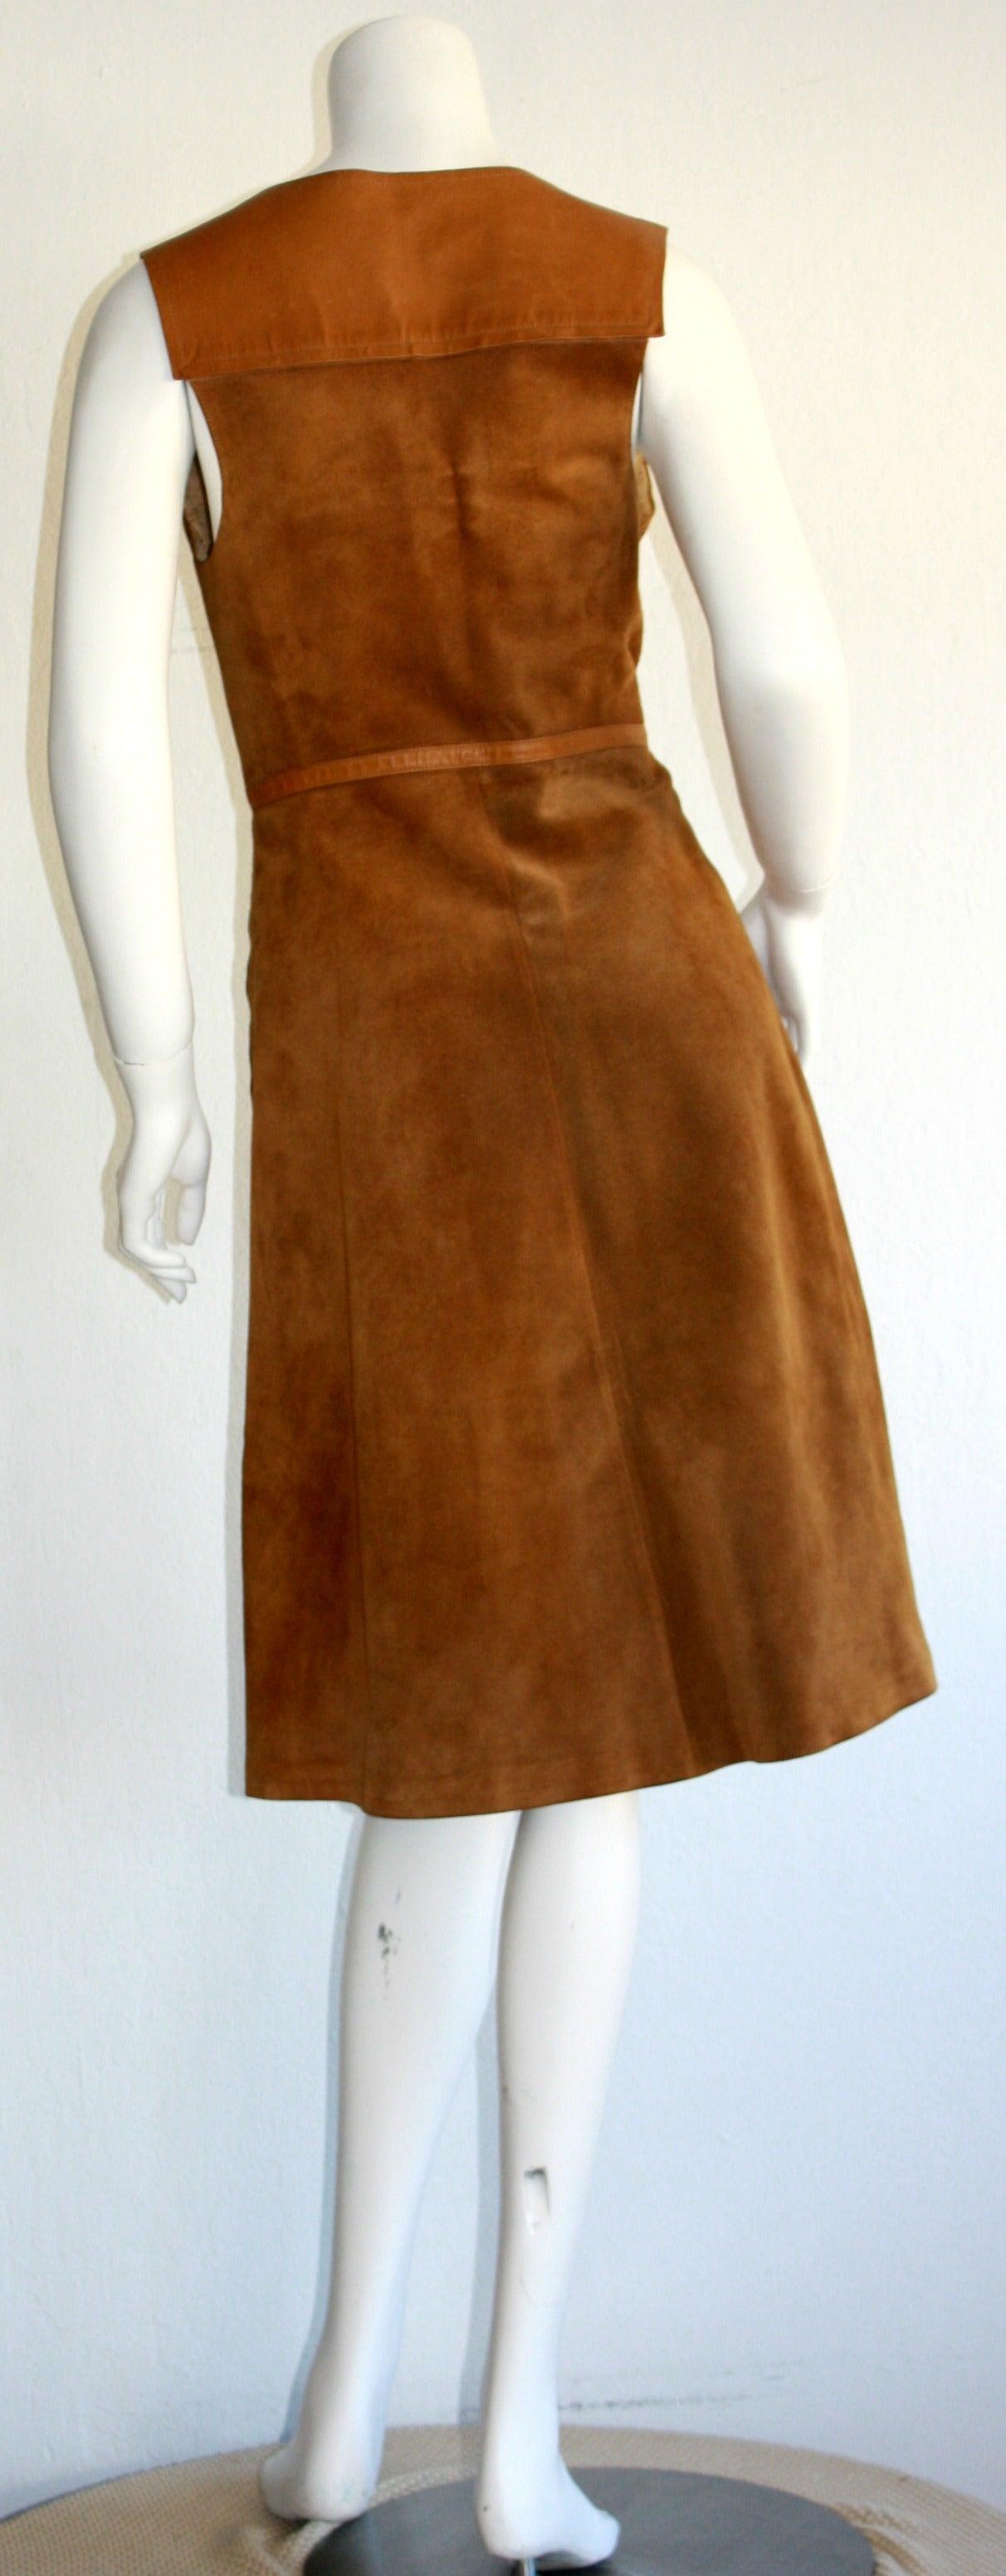 Rare Vintage 1960s Gucci Tan Leather Horsebit A - Line Space Age Dress 4